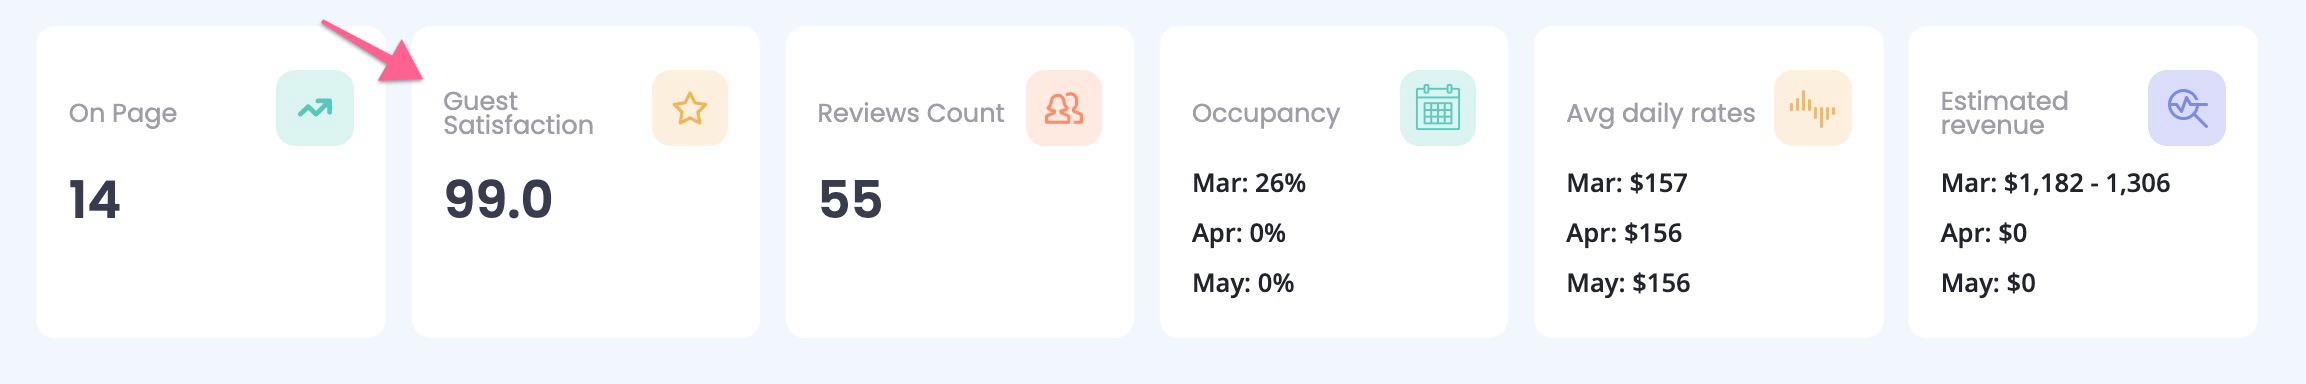 Airbnb Guest Satisfaction in Rankbreeze Dashboard